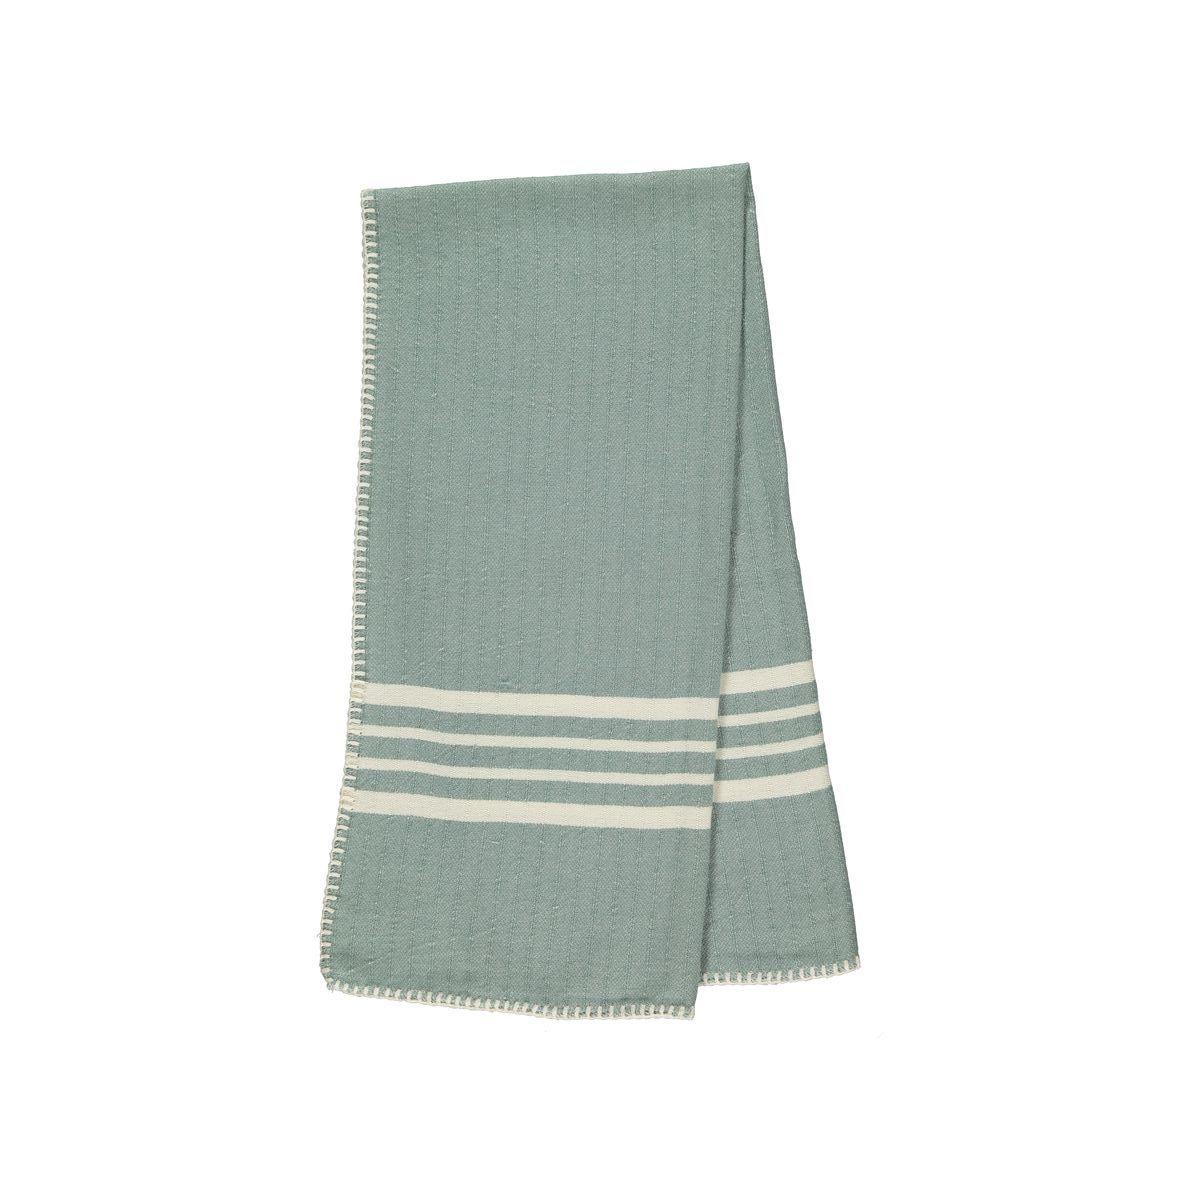 Peshkir Sultan - Stitched / Almond Green